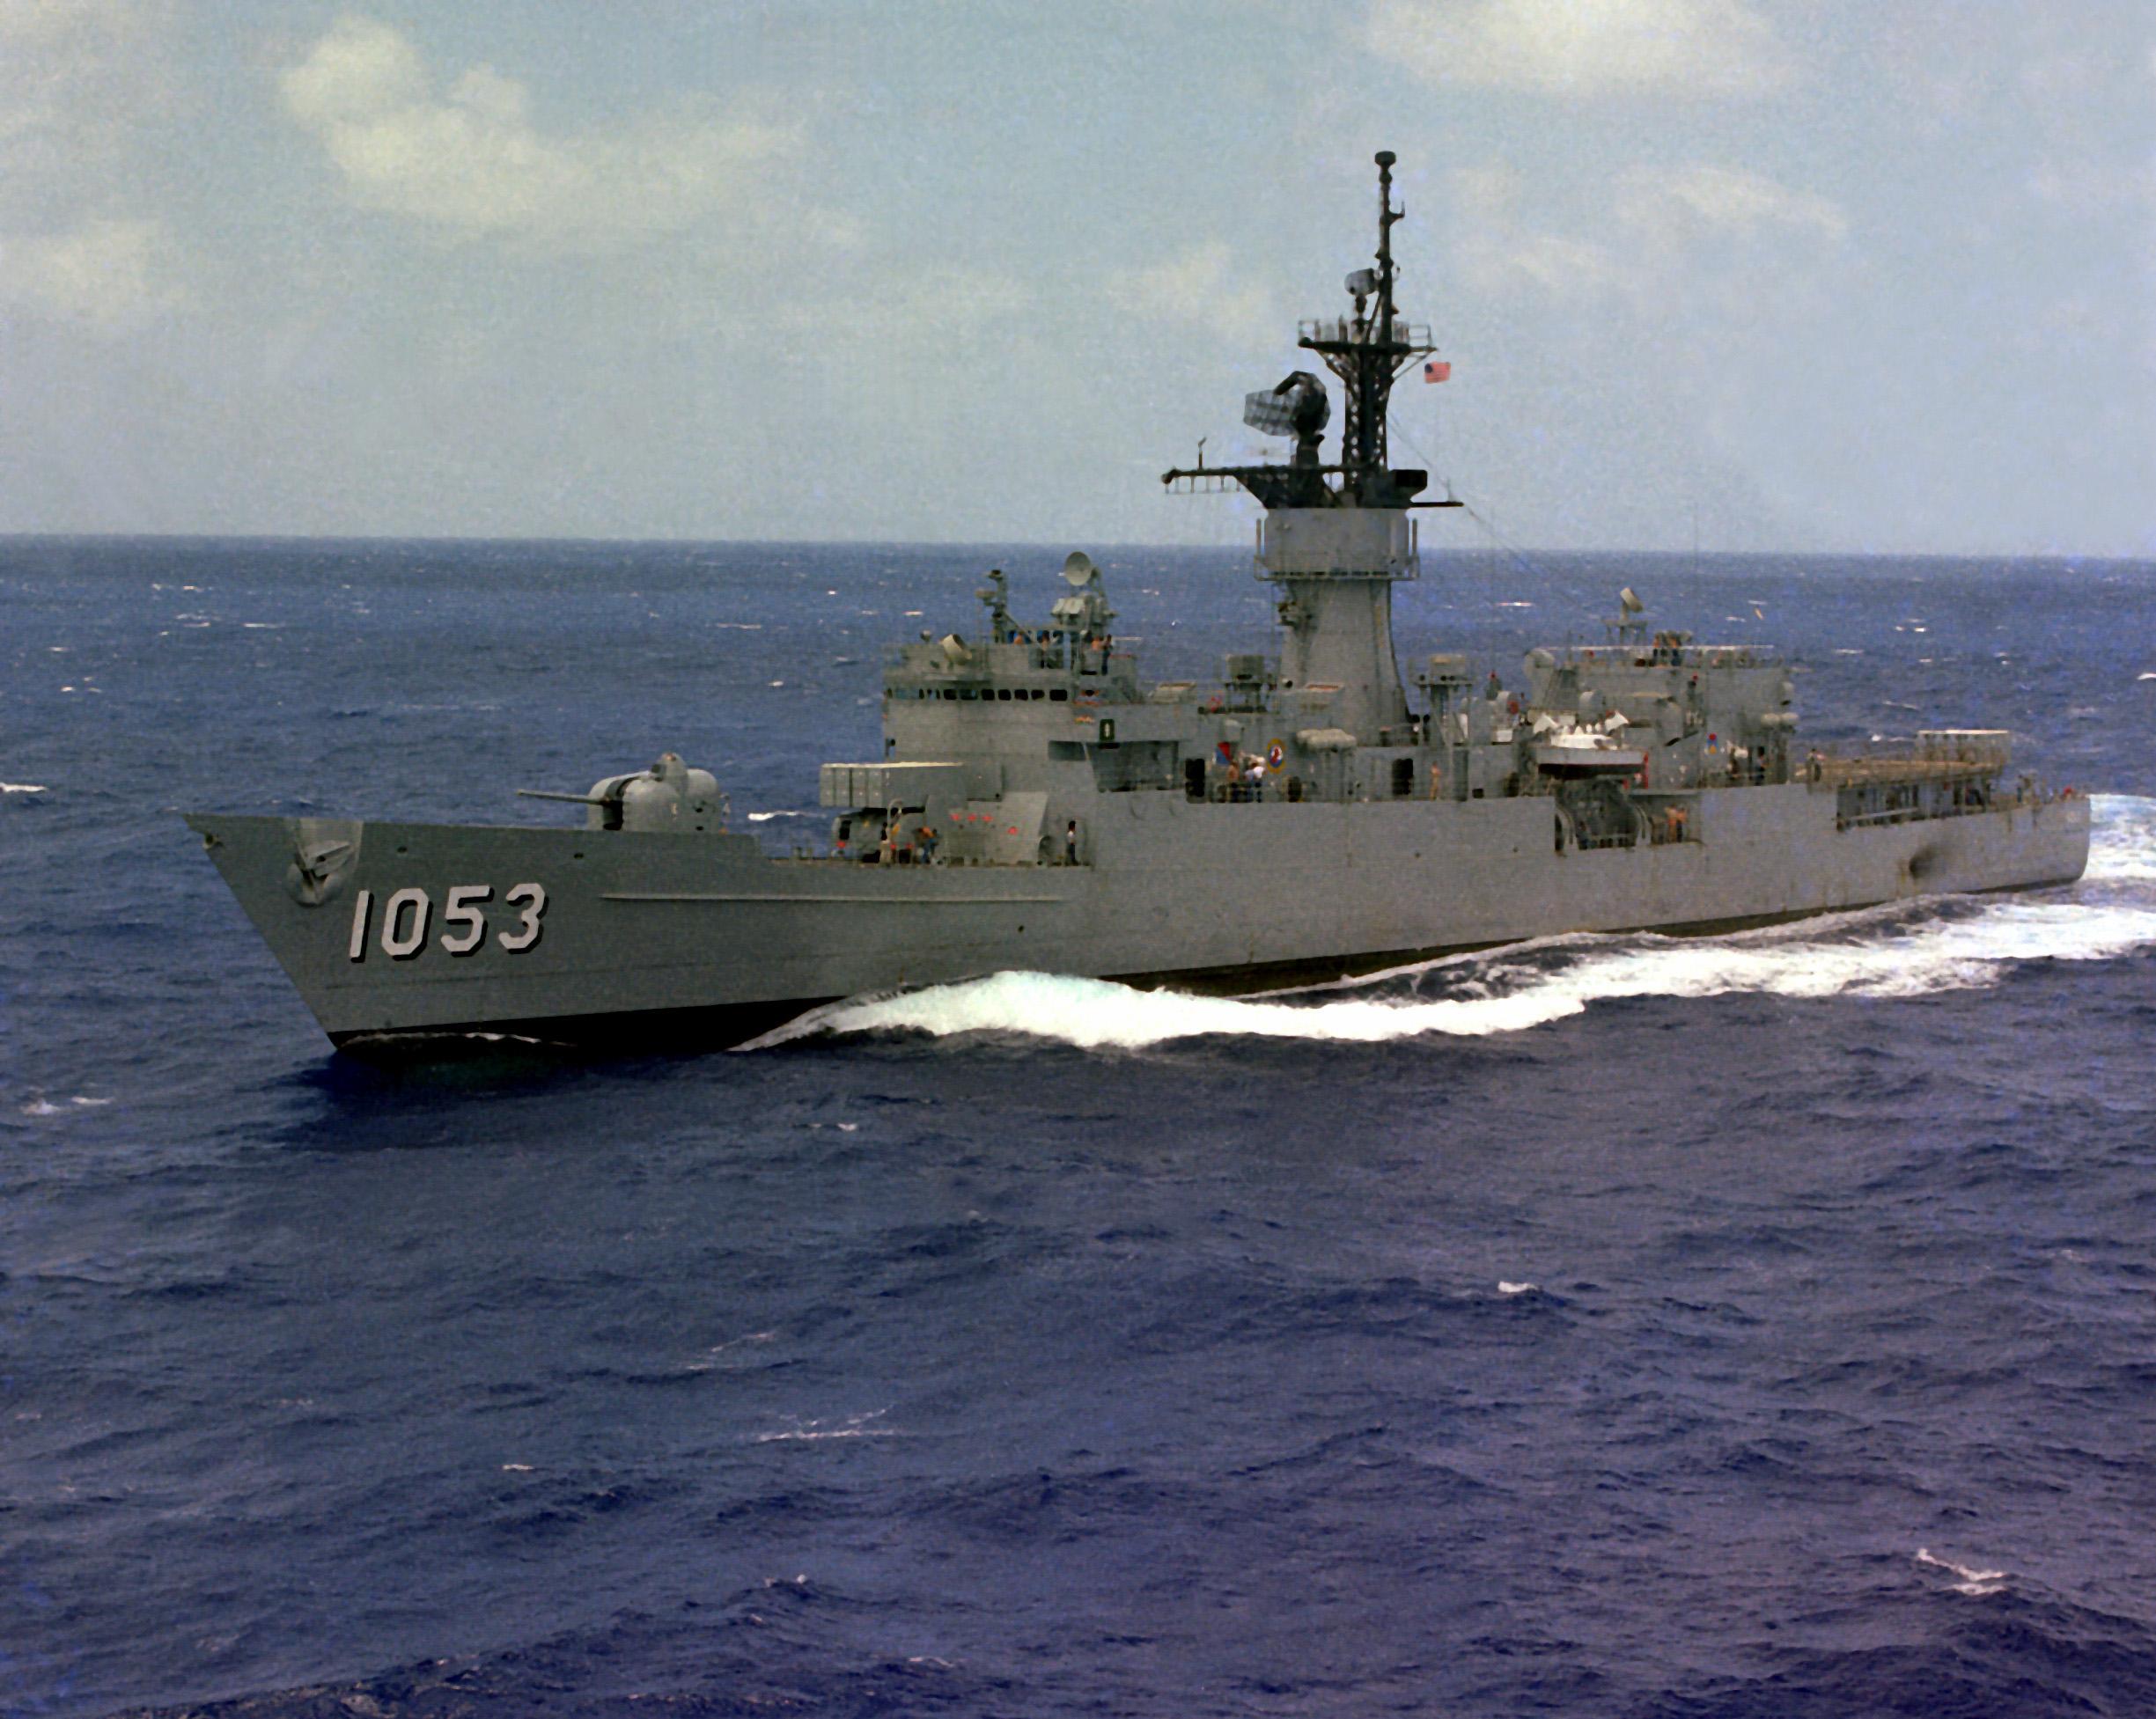 File:USS Roark (FF-1053) off Hawaii.jpg